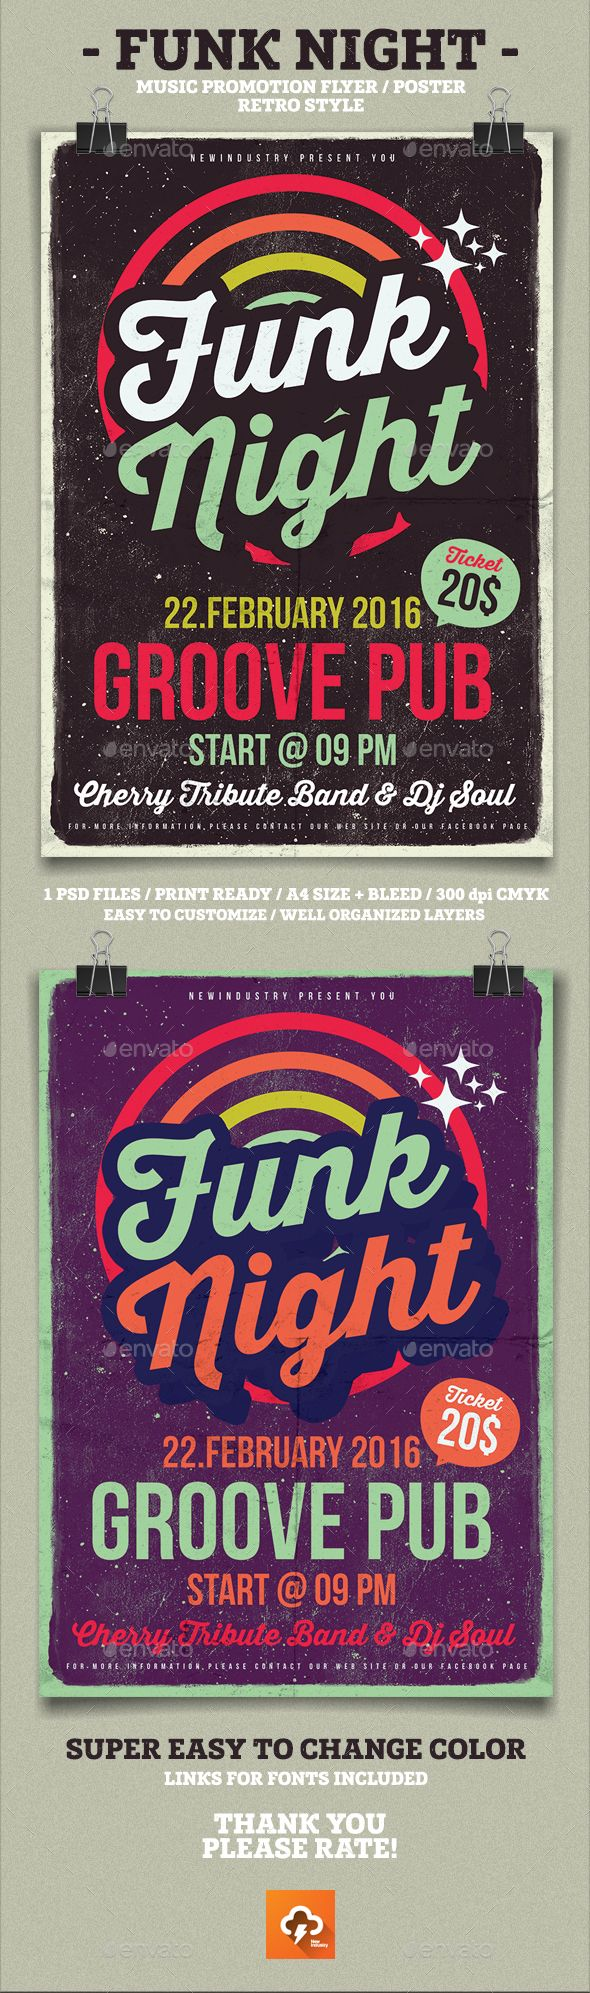 Funk Poster Flyer Template PSD #design Download: http://graphicriver.net/item/funk-poster-flyer/14422102?ref=ksioks